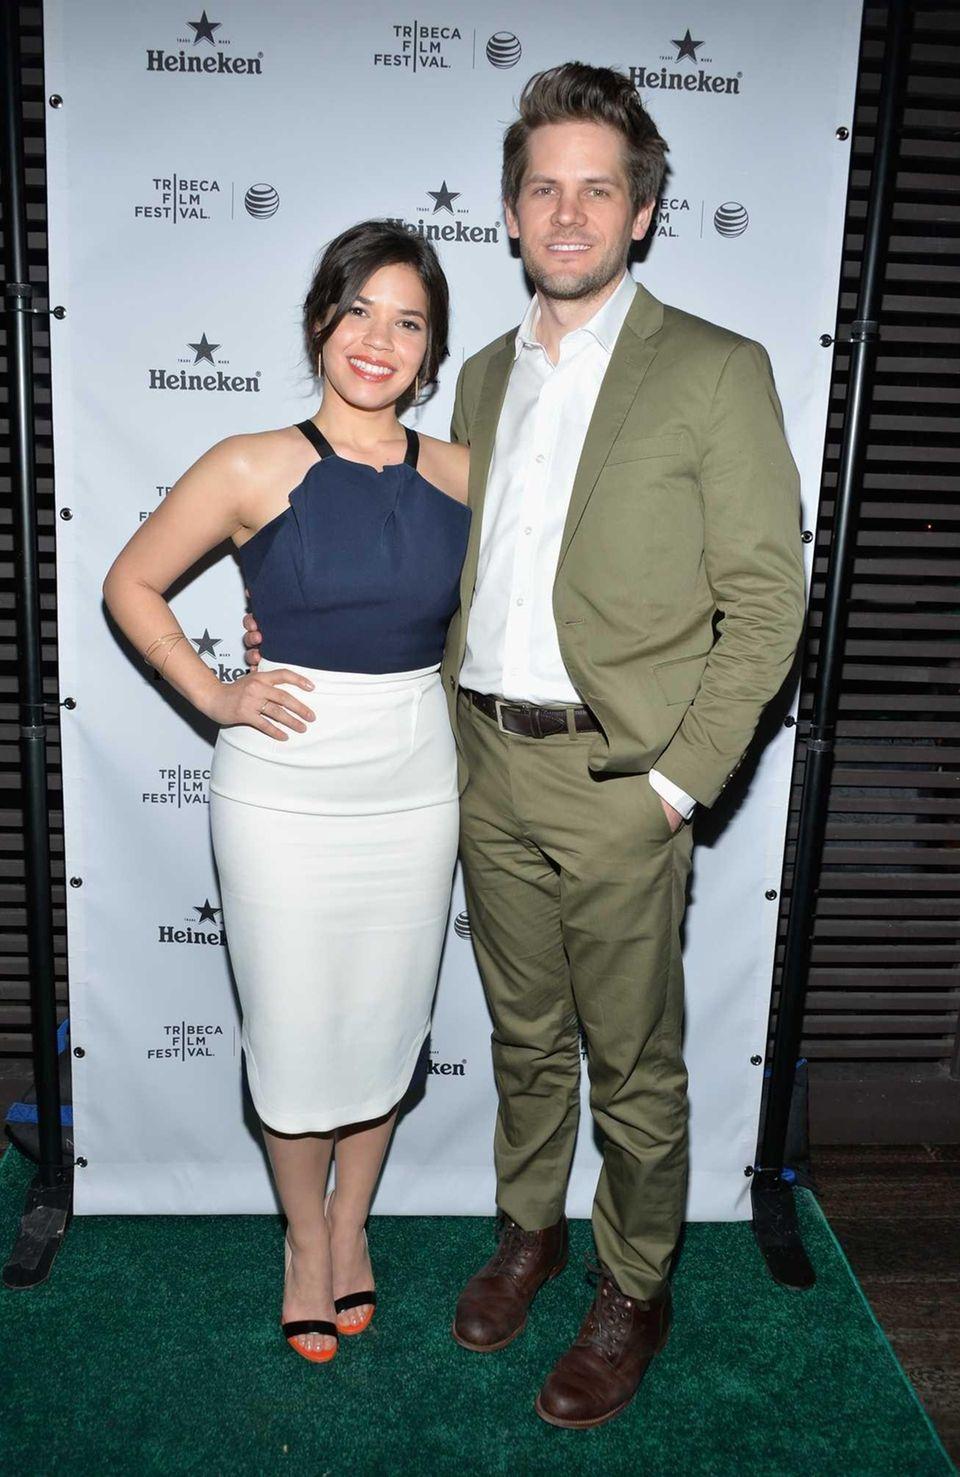 Actress America Ferrera and director Ryan Piers Williams